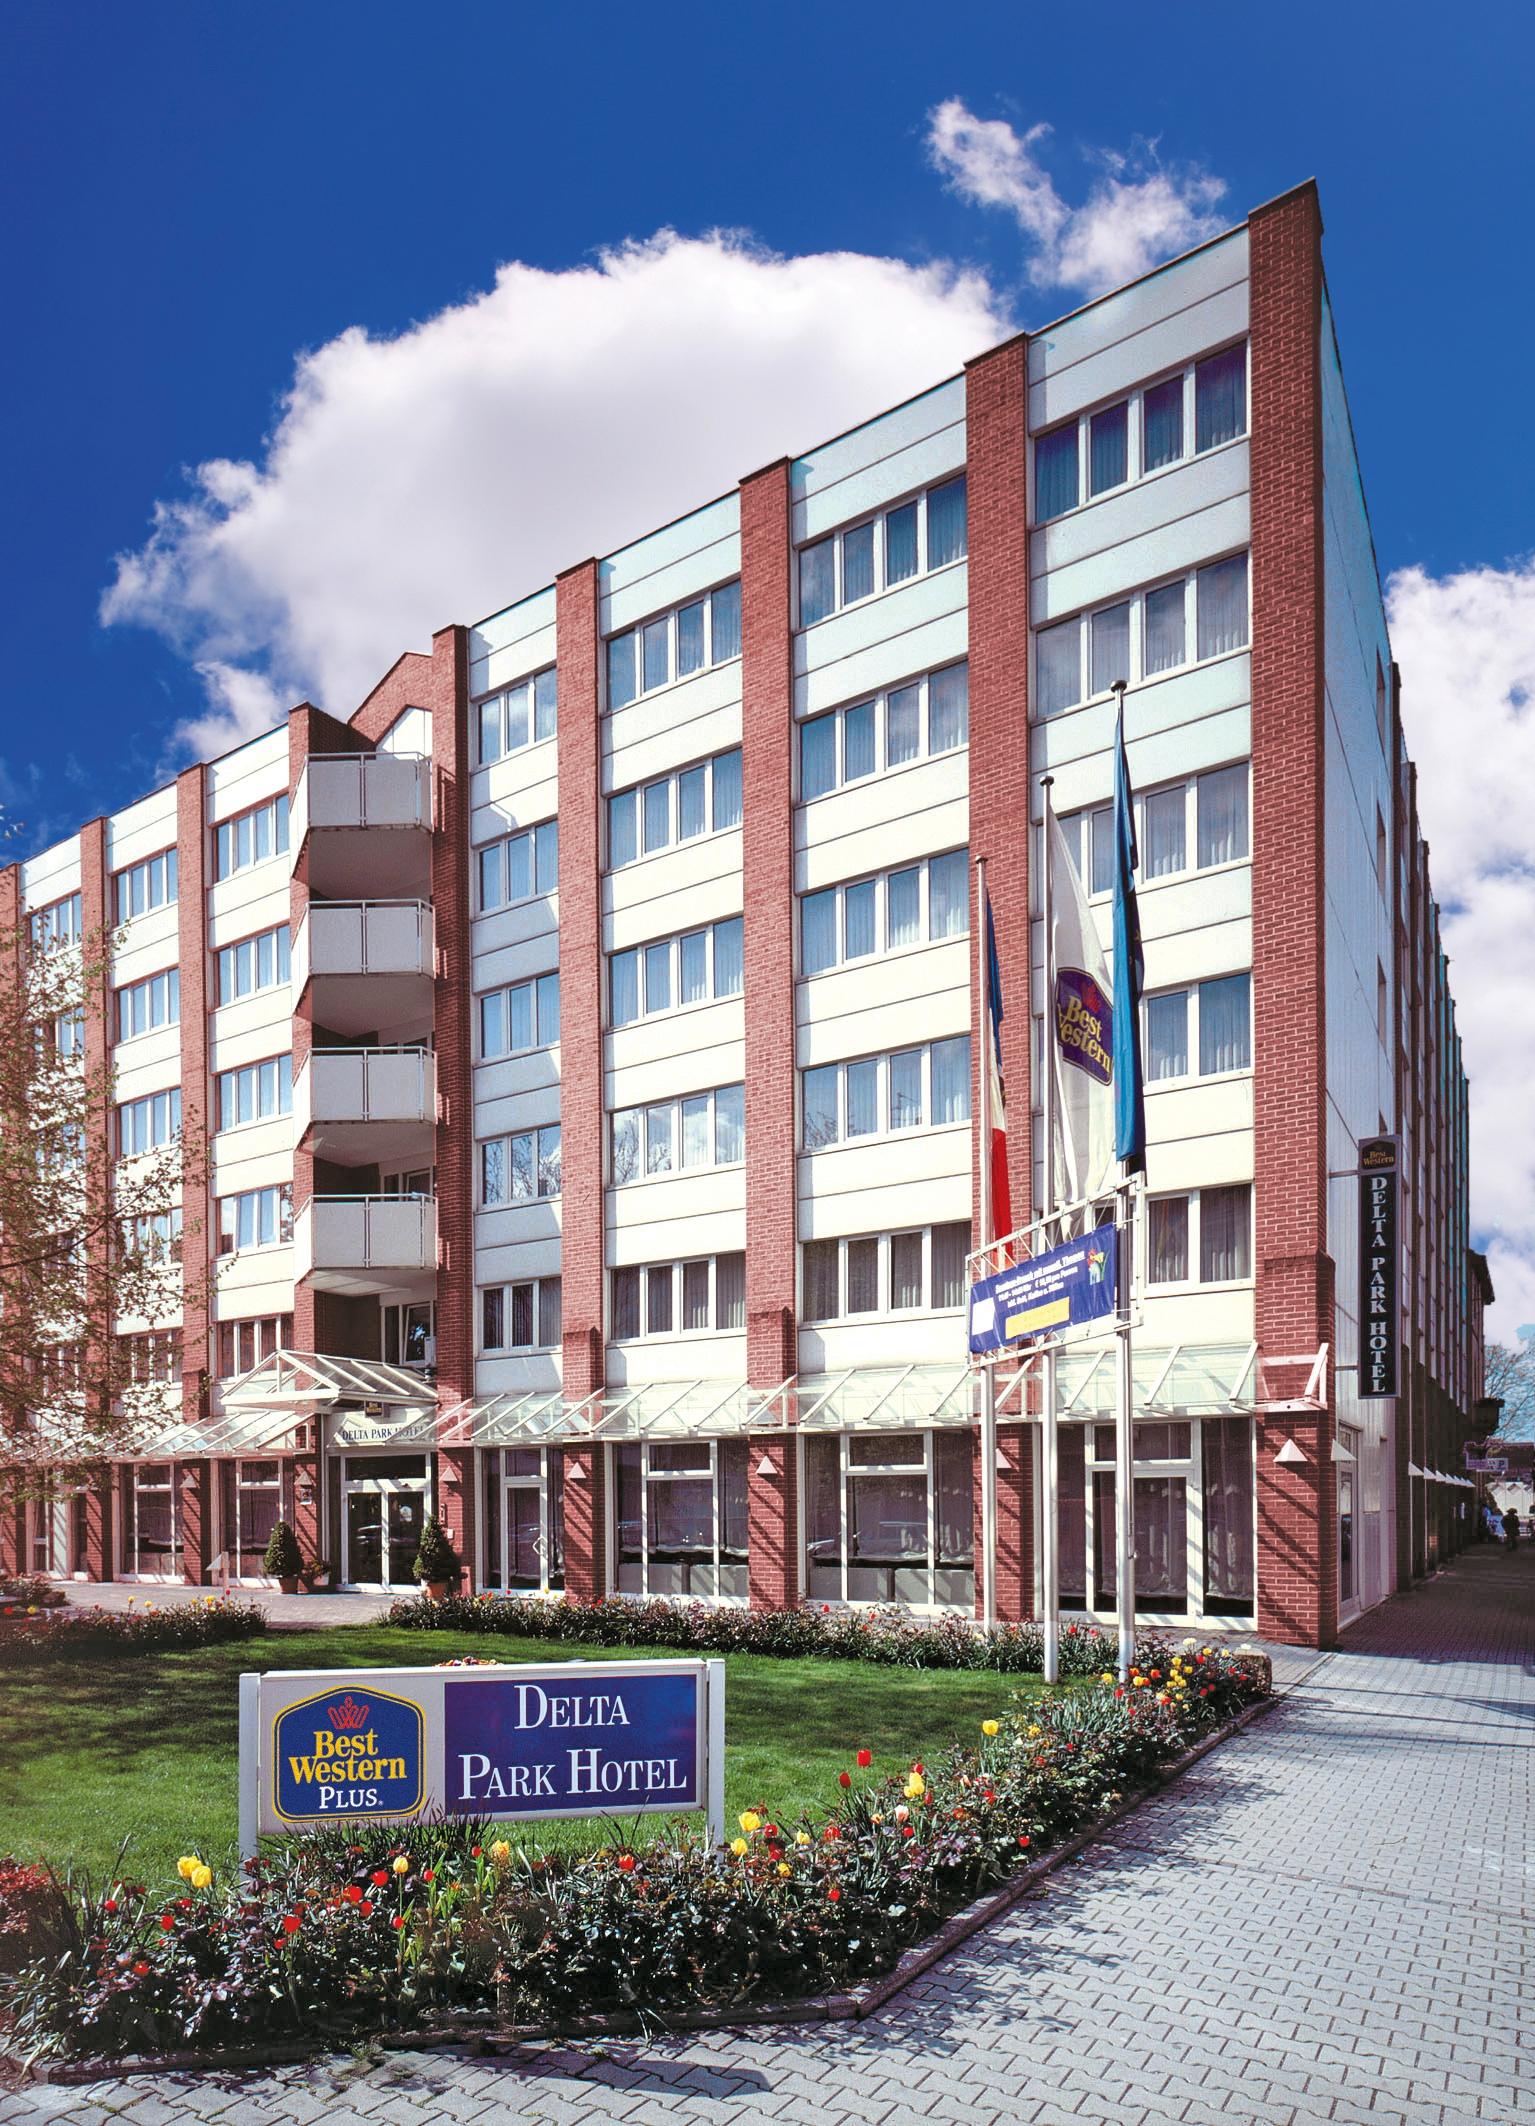 Best Western Plus Delta Park Hotel Hotels Hotels